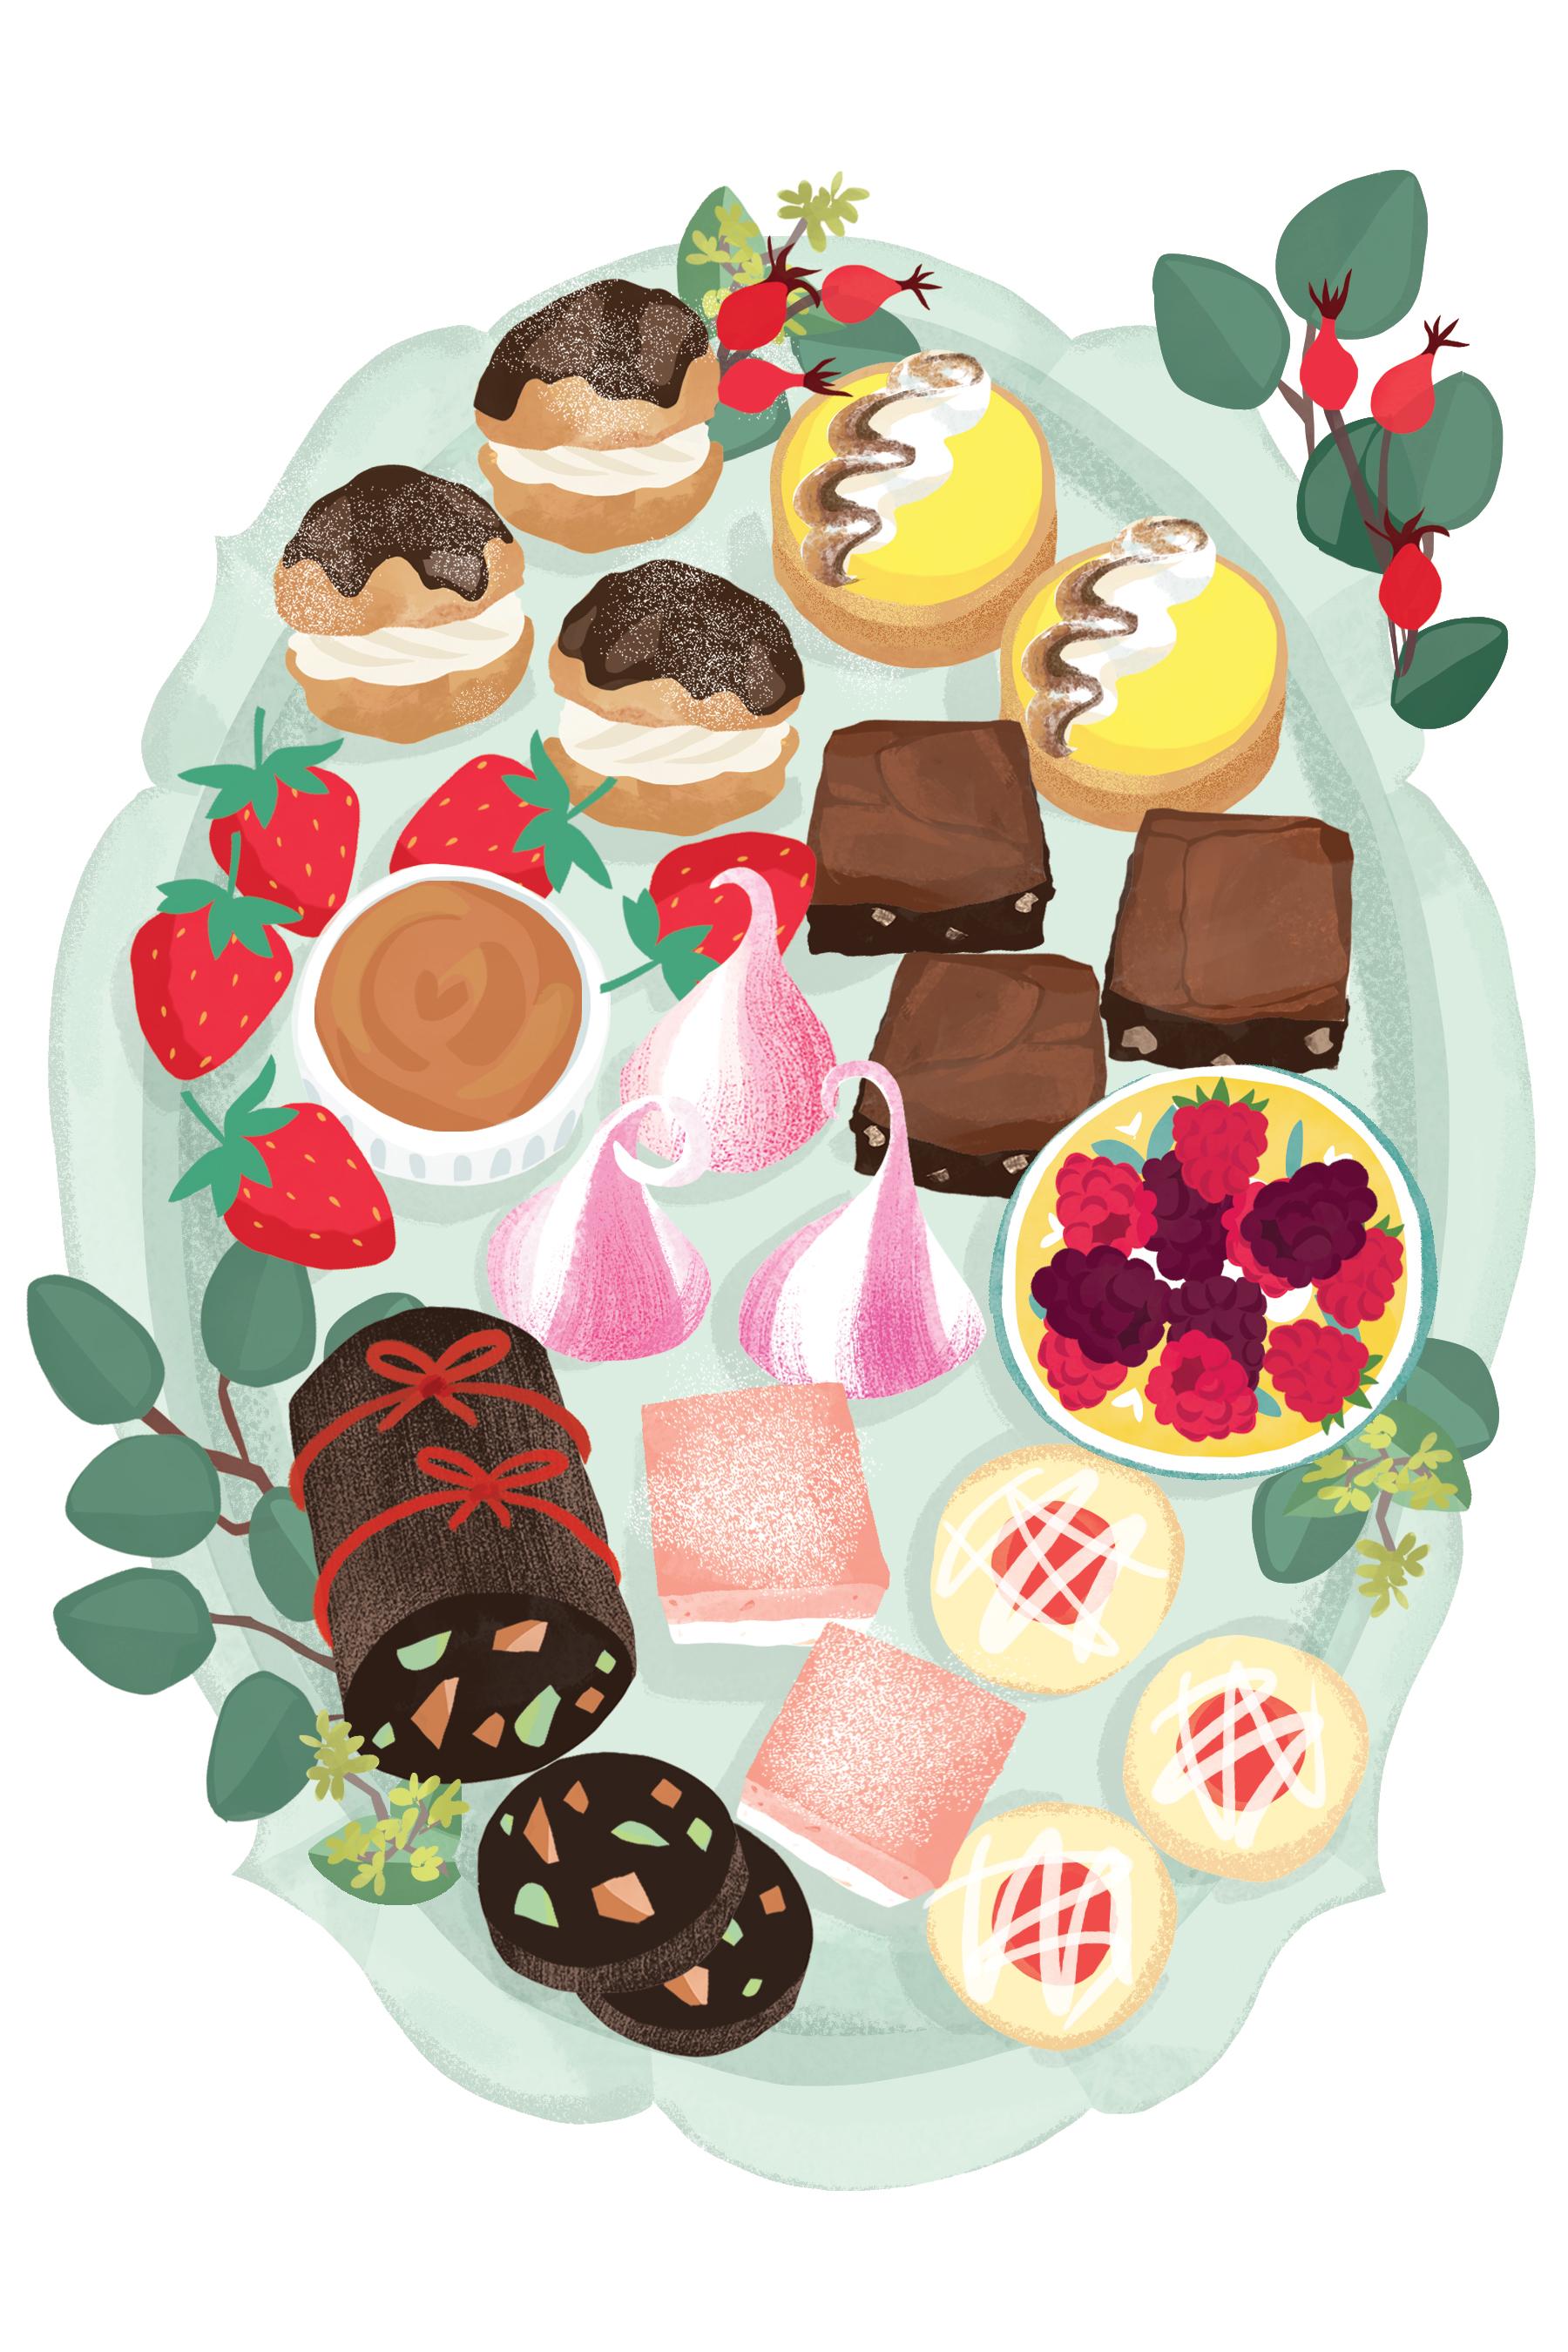 Dessert Board Flo Leung illustration.jpg